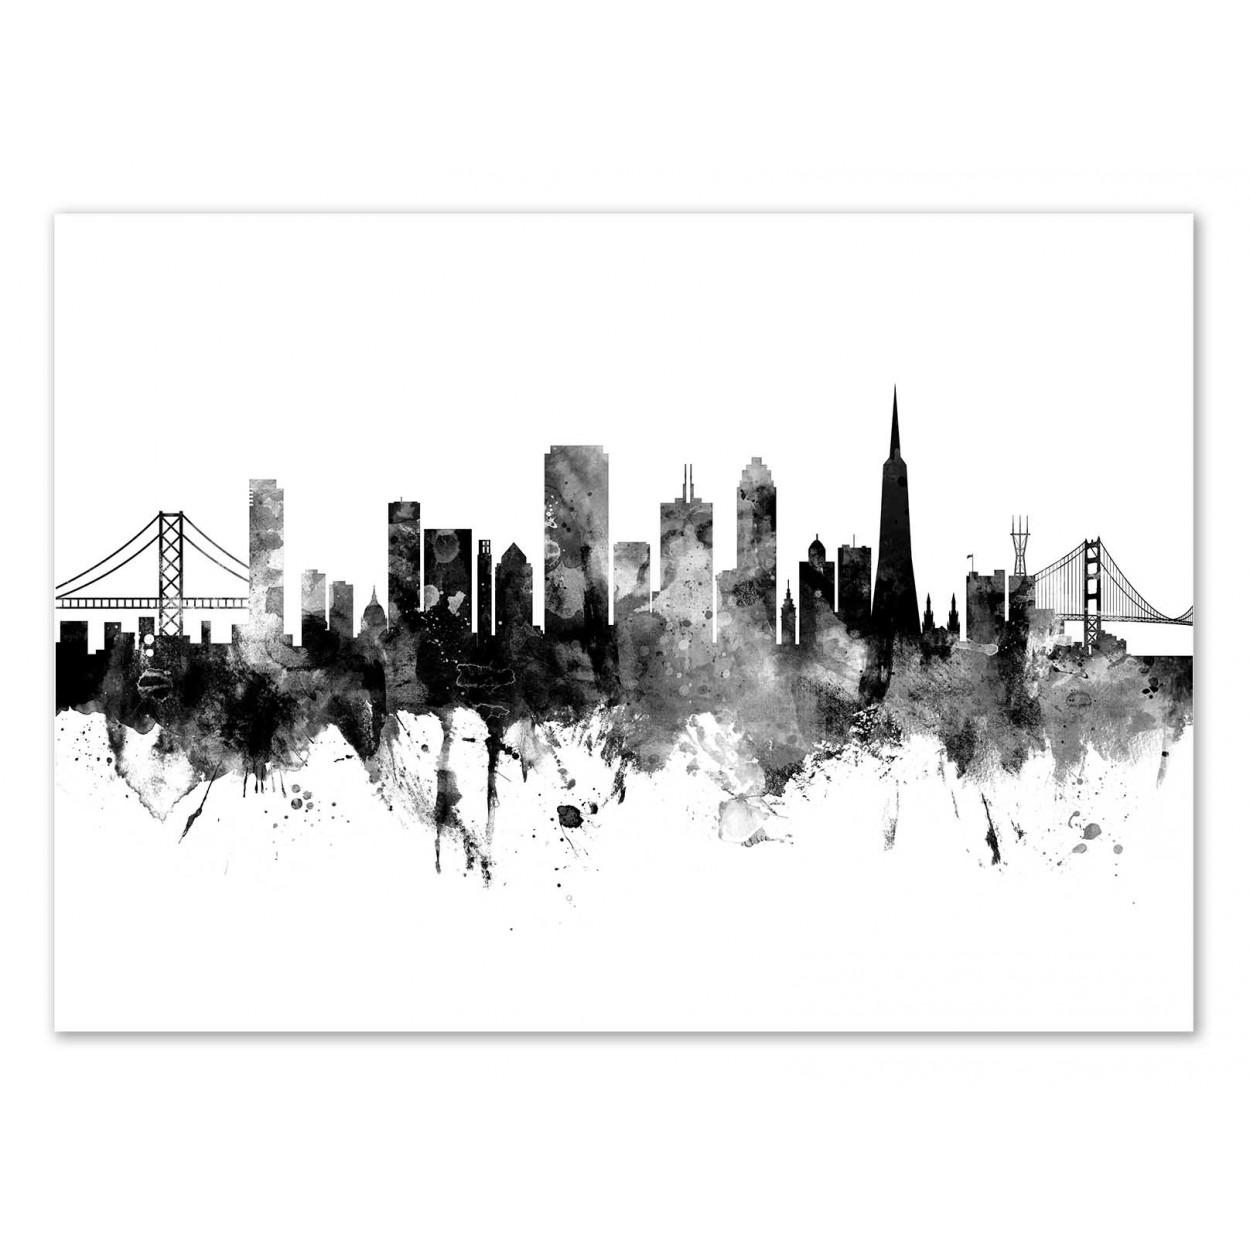 SAN FRANCISCO SKYLINE - Affiche d'art 50 x 70 cm - Michael Tompsett